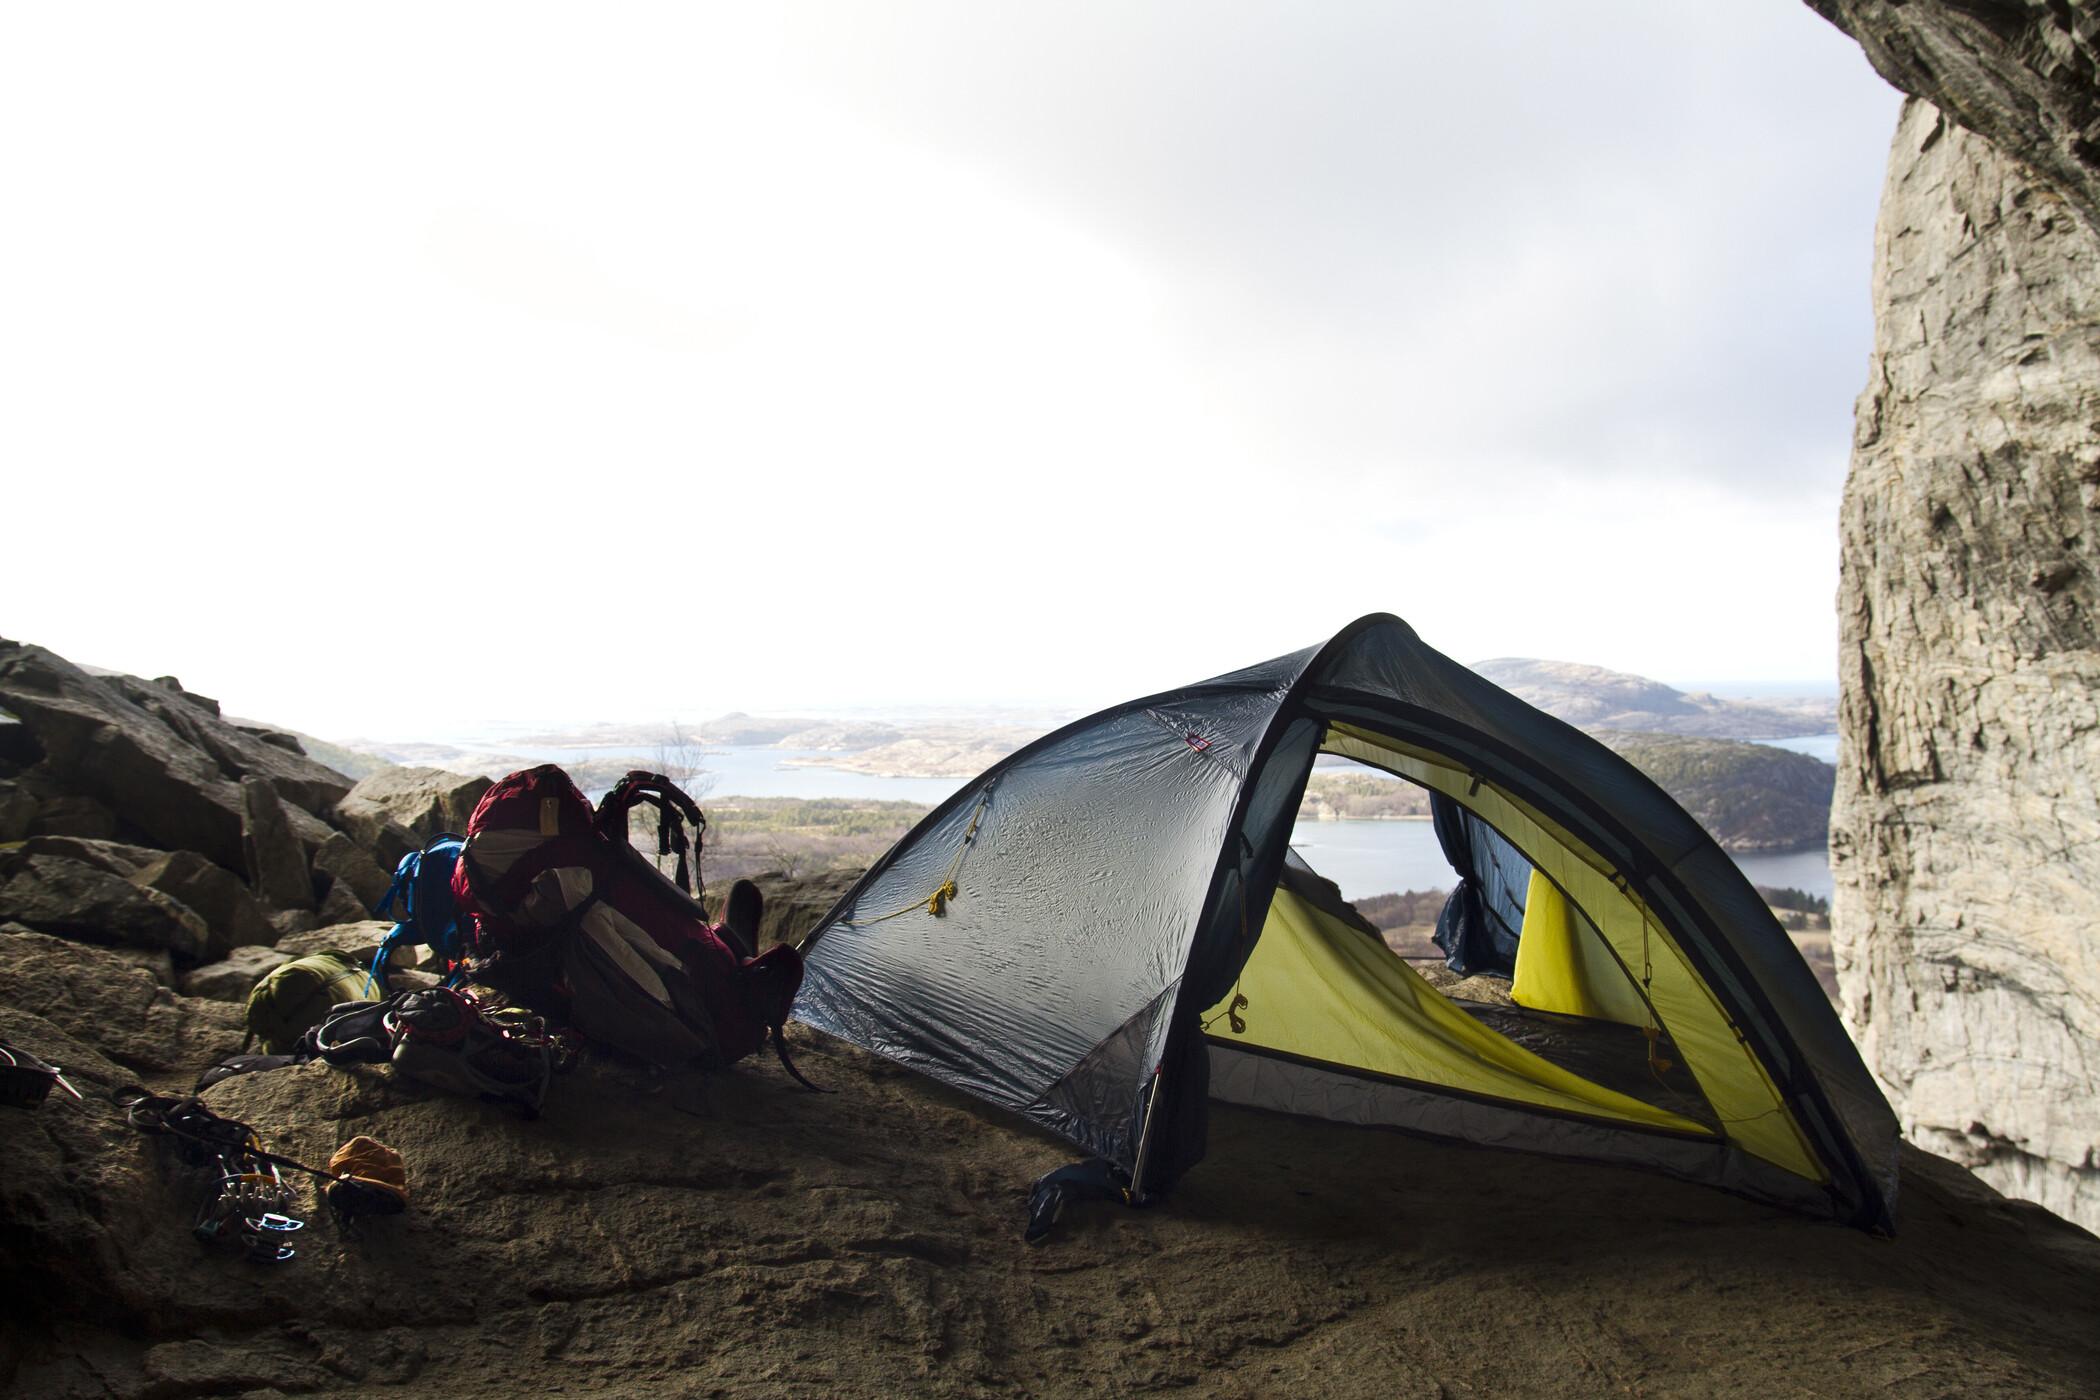 Helsport Reinsfjell Superlight 2 Tent